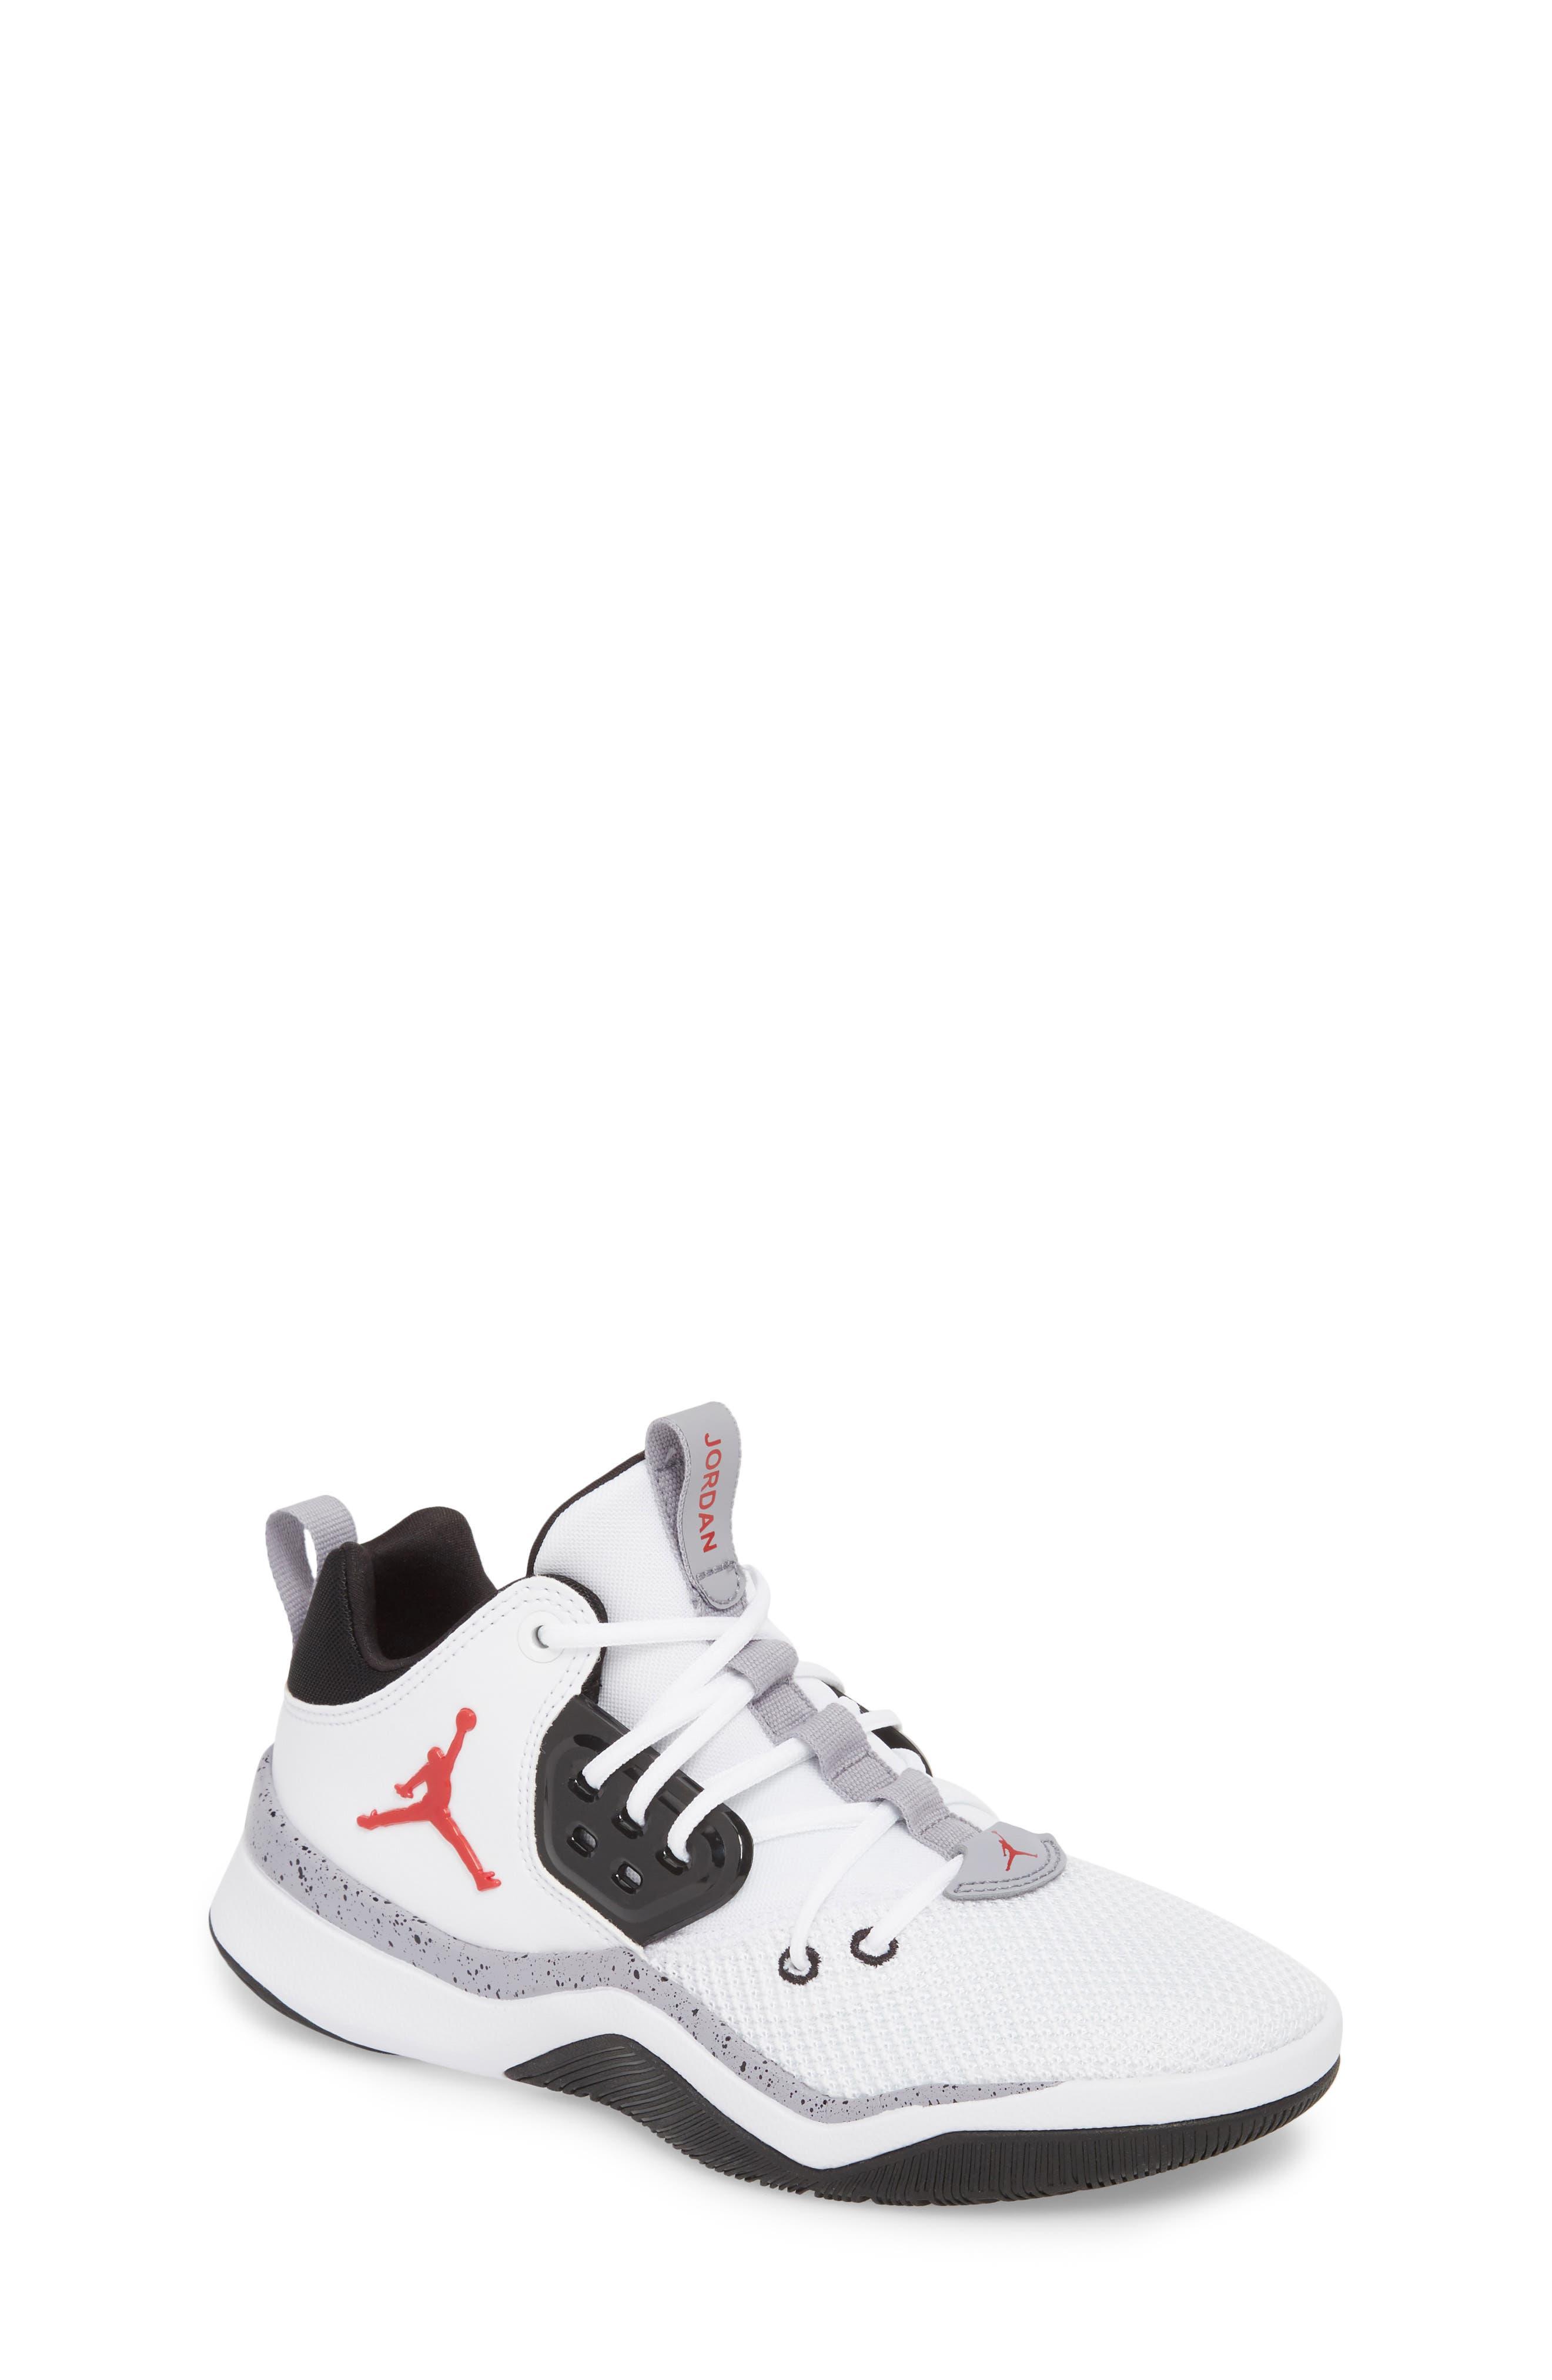 DNA Sneaker,                         Main,                         color, 103